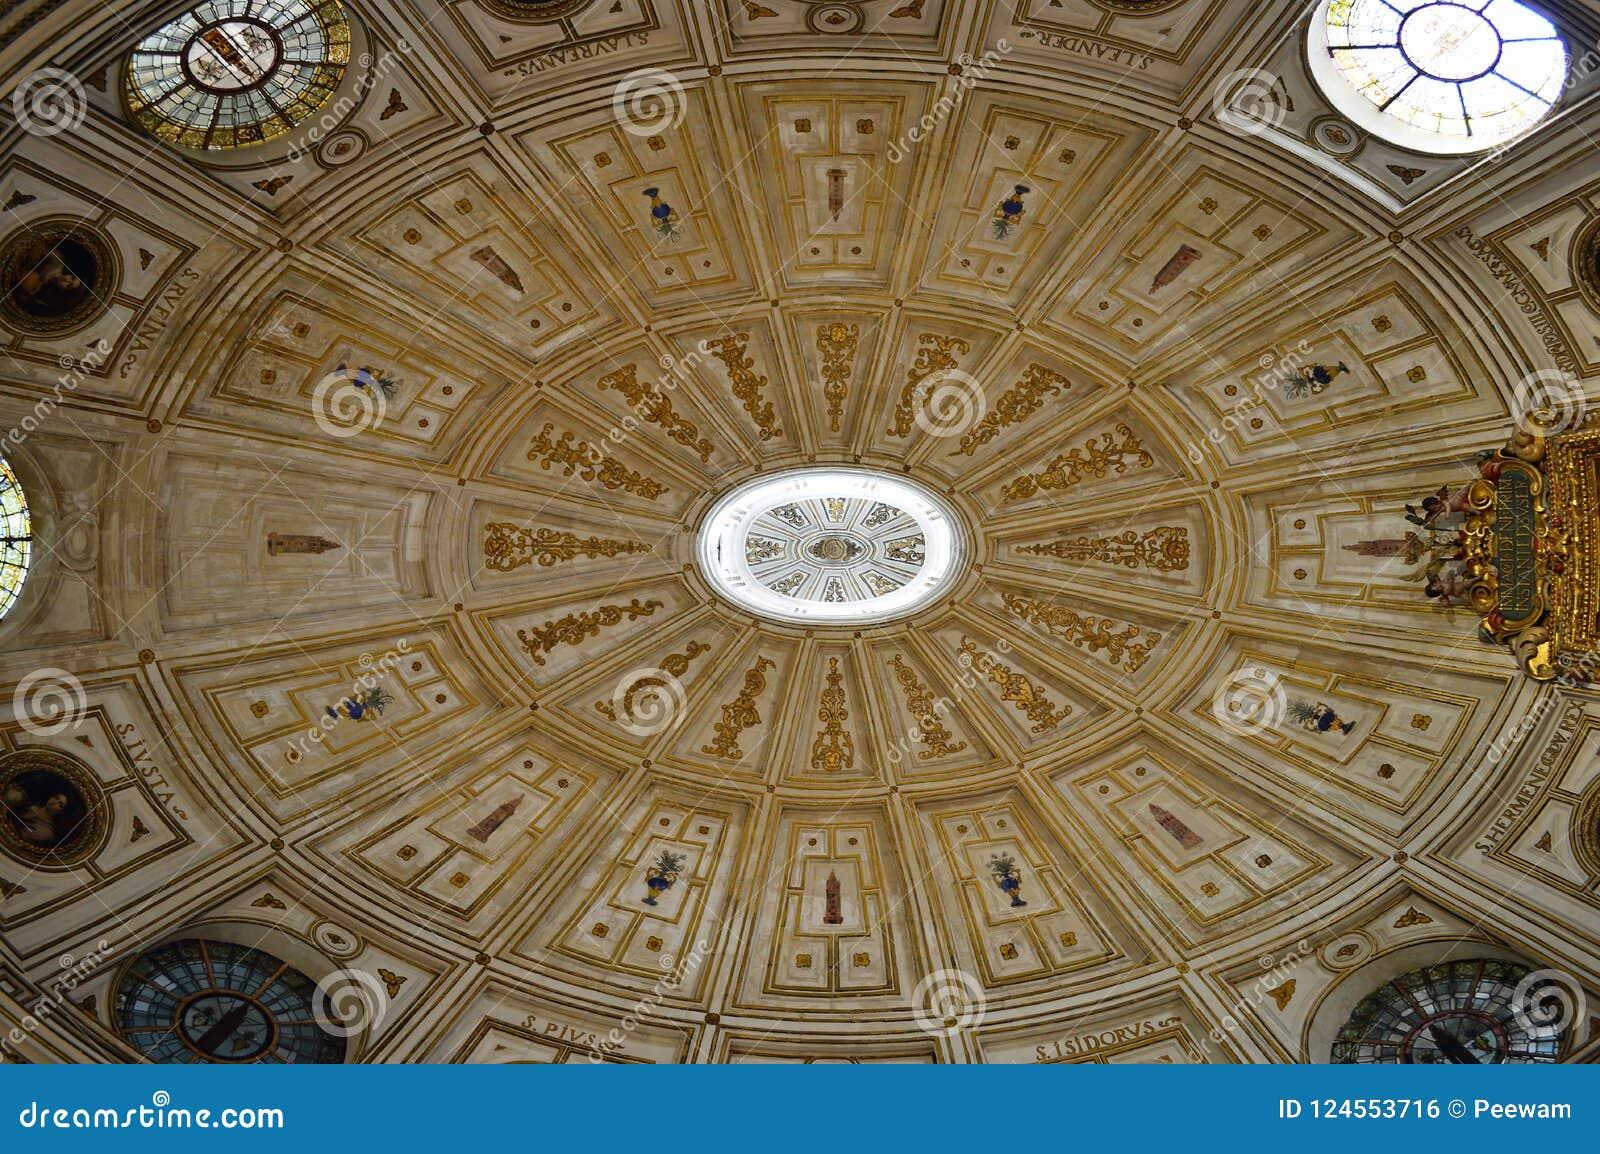 Seville Cathedral Interior ceiling detail of Renaissance vault